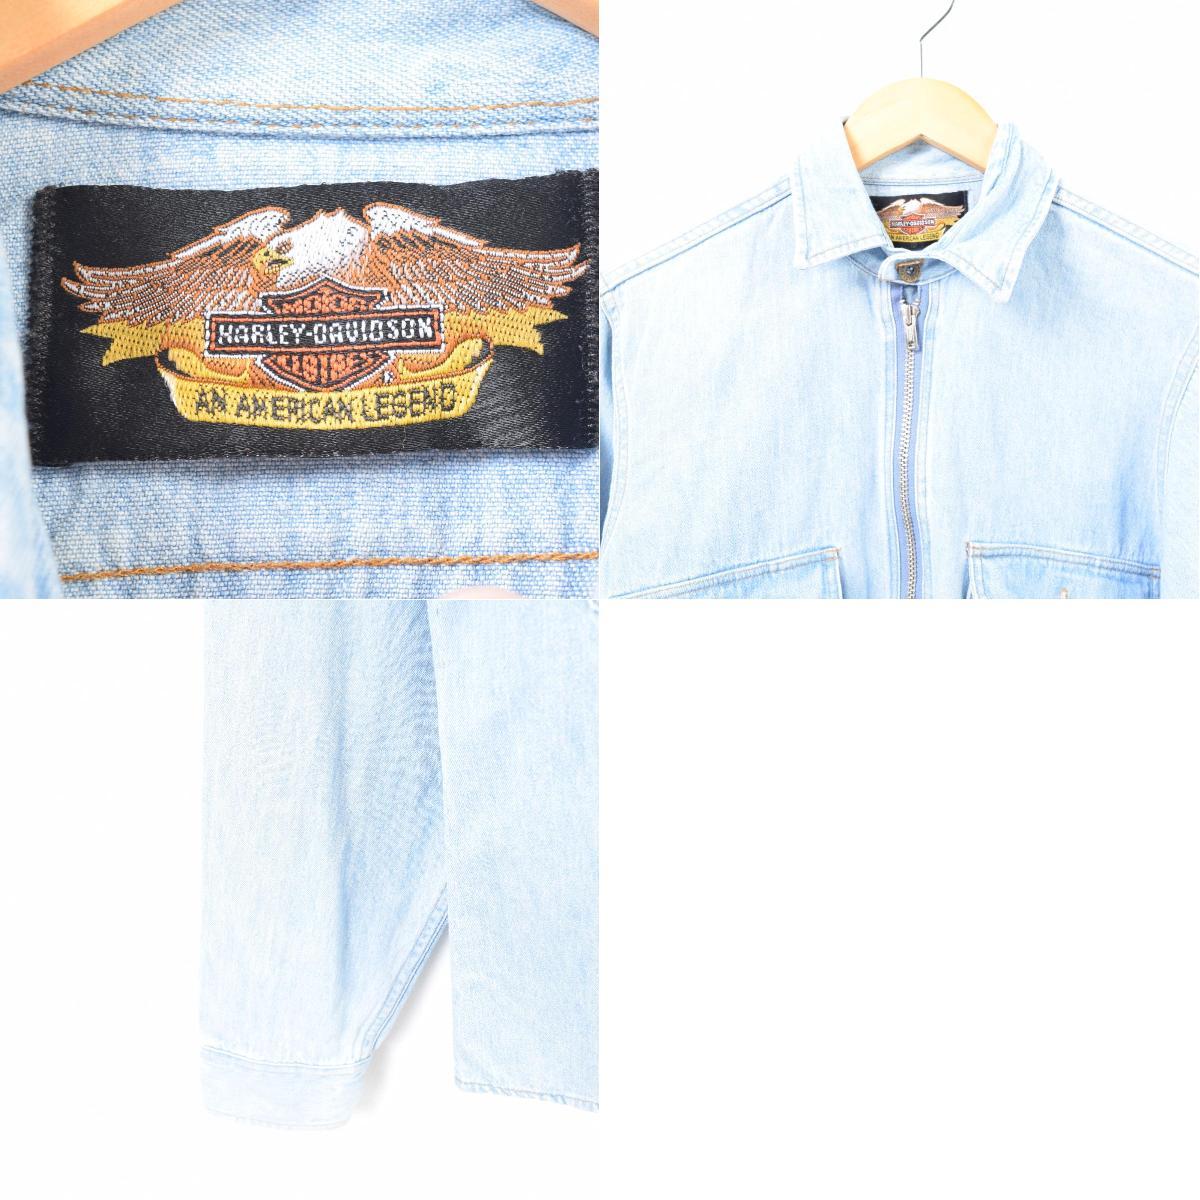 56fdf03a40 Harley-Davidson Harley-Davidson half zip pullover long sleeves denim shirt  men XS  war6064